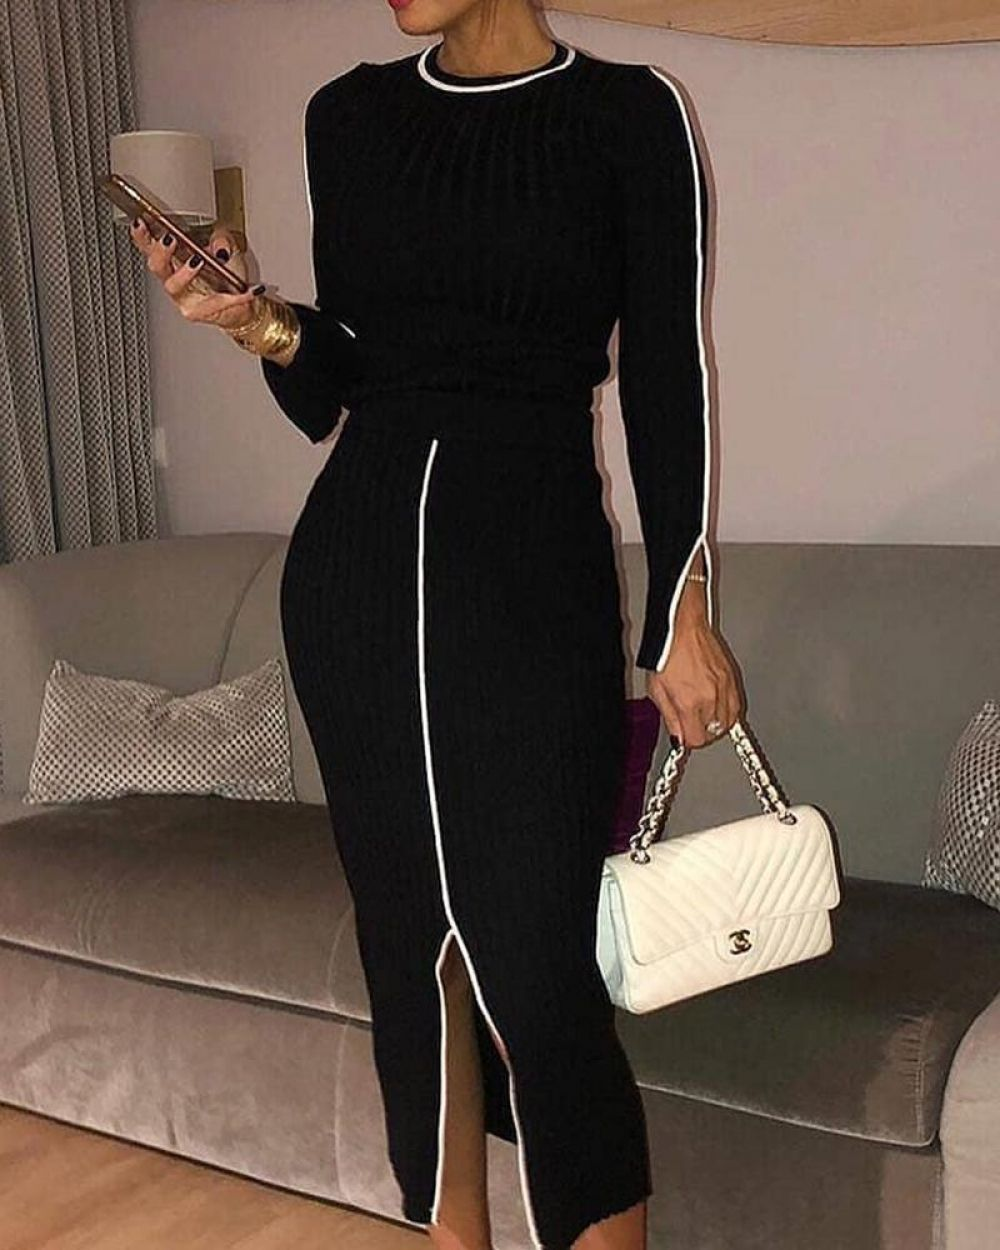 Women Elegant Minimalist Long Sleeve Tops Amp Bottom Split Skirts Set Autumn Casual 2 Piece Sets Womens Outfit Long Sleeve Tops Clothes For Women Long Sleeve [ 1250 x 1000 Pixel ]